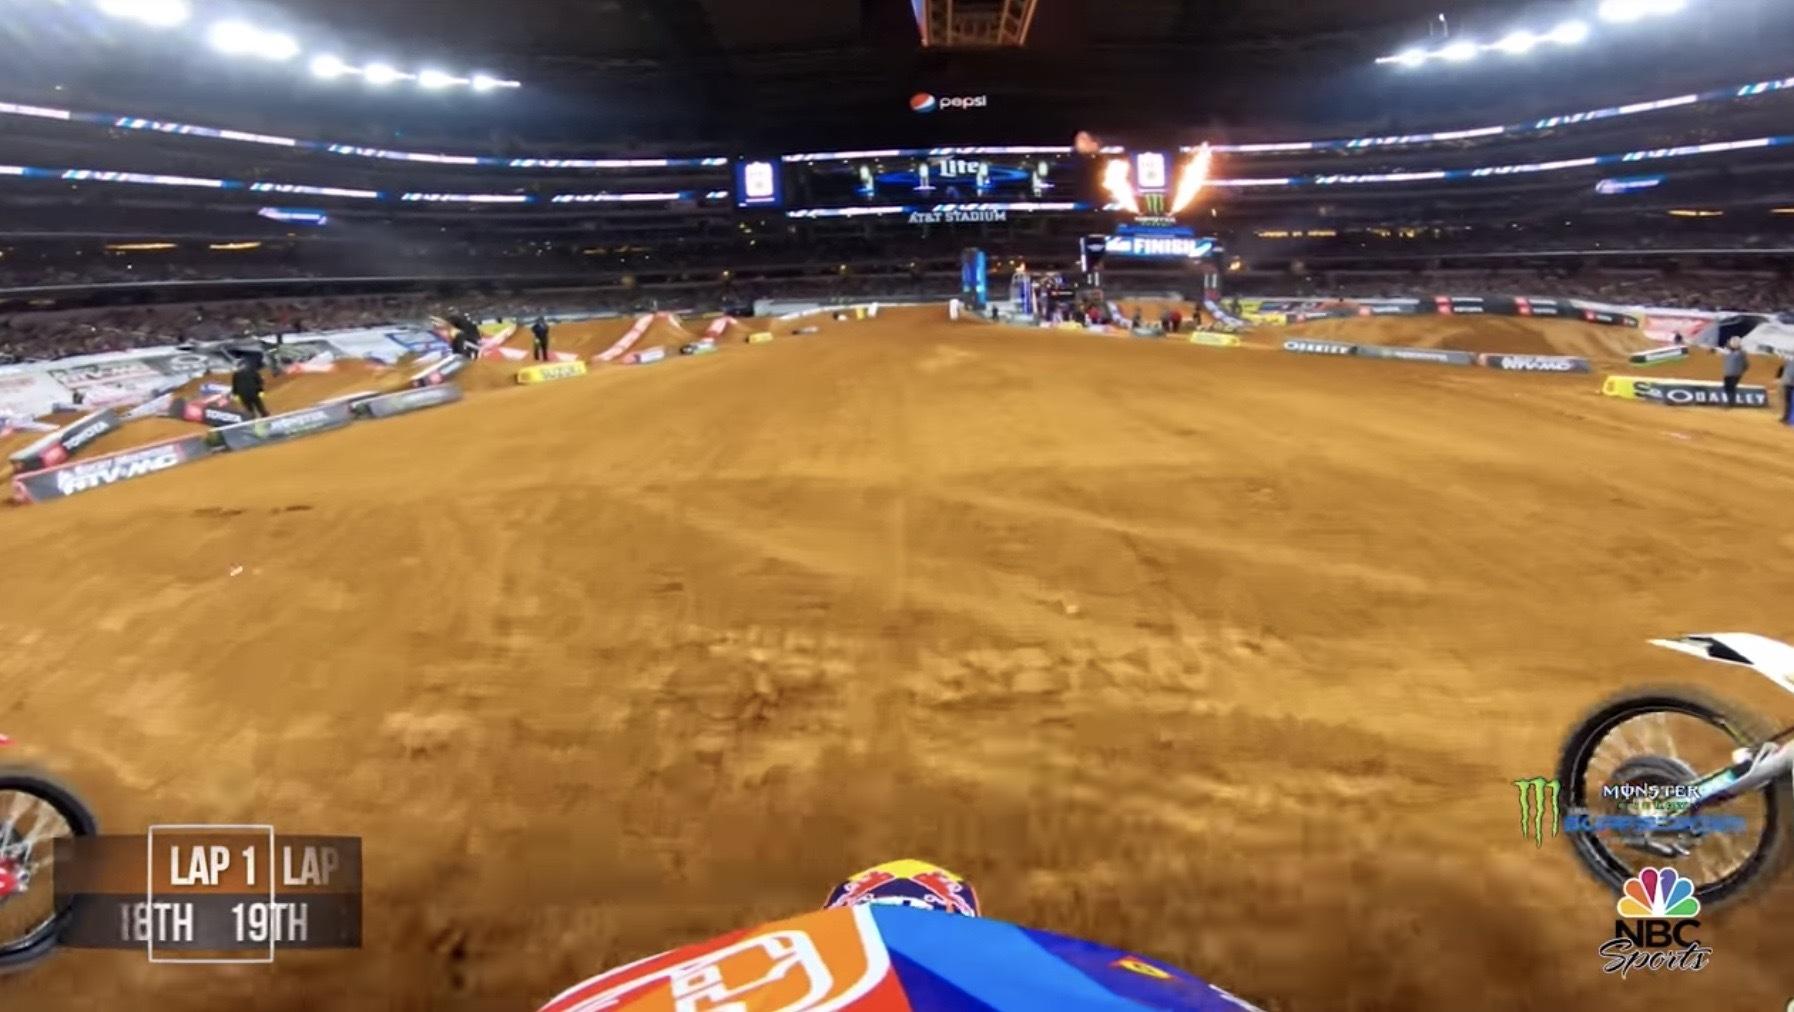 2019 Arlington Supercross